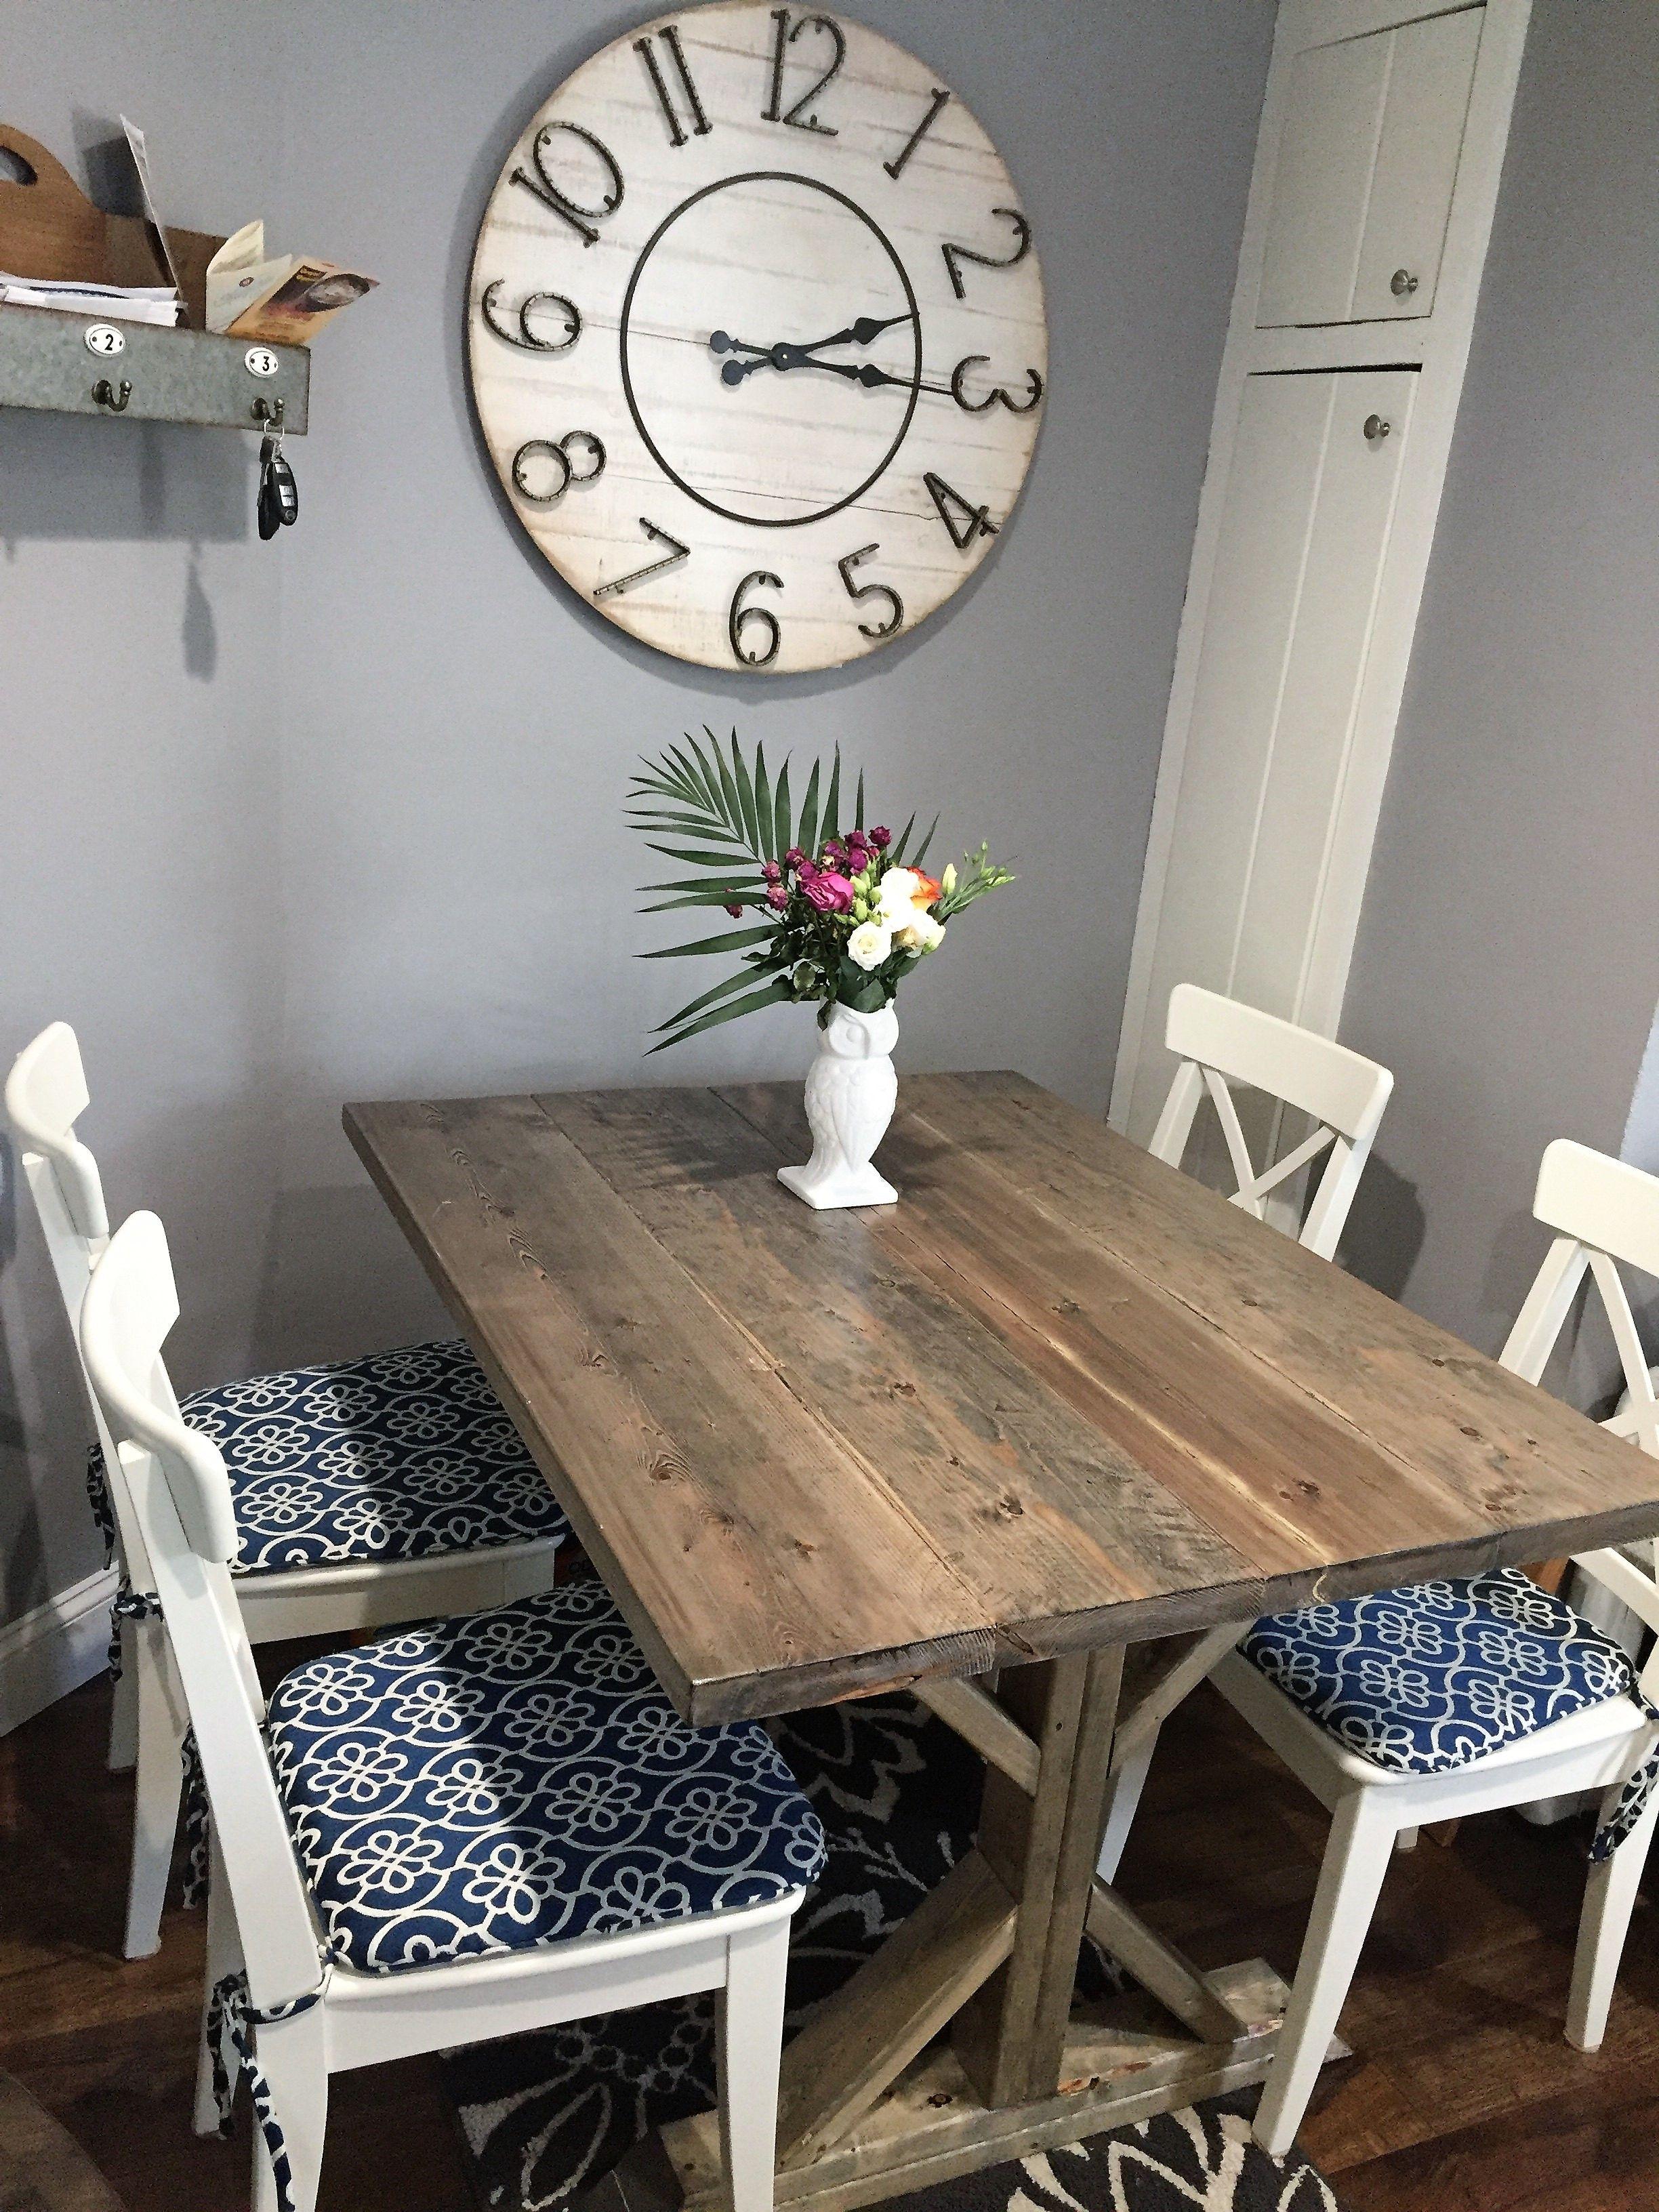 Buy A Hand Made Rustic Beachy Farmhouse Trestle Dining